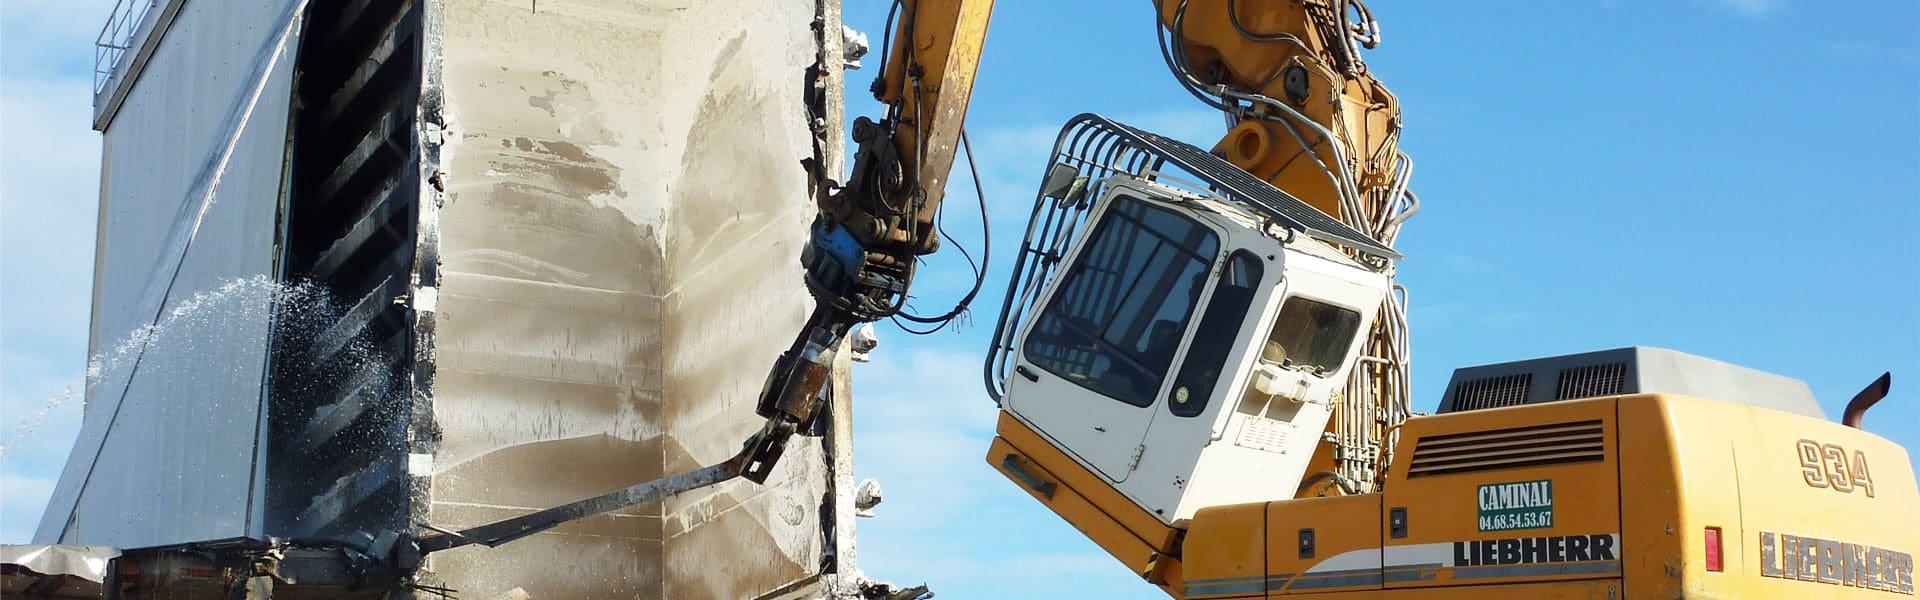 demolition-caminal-destruction-usine-cemoi-perpignan